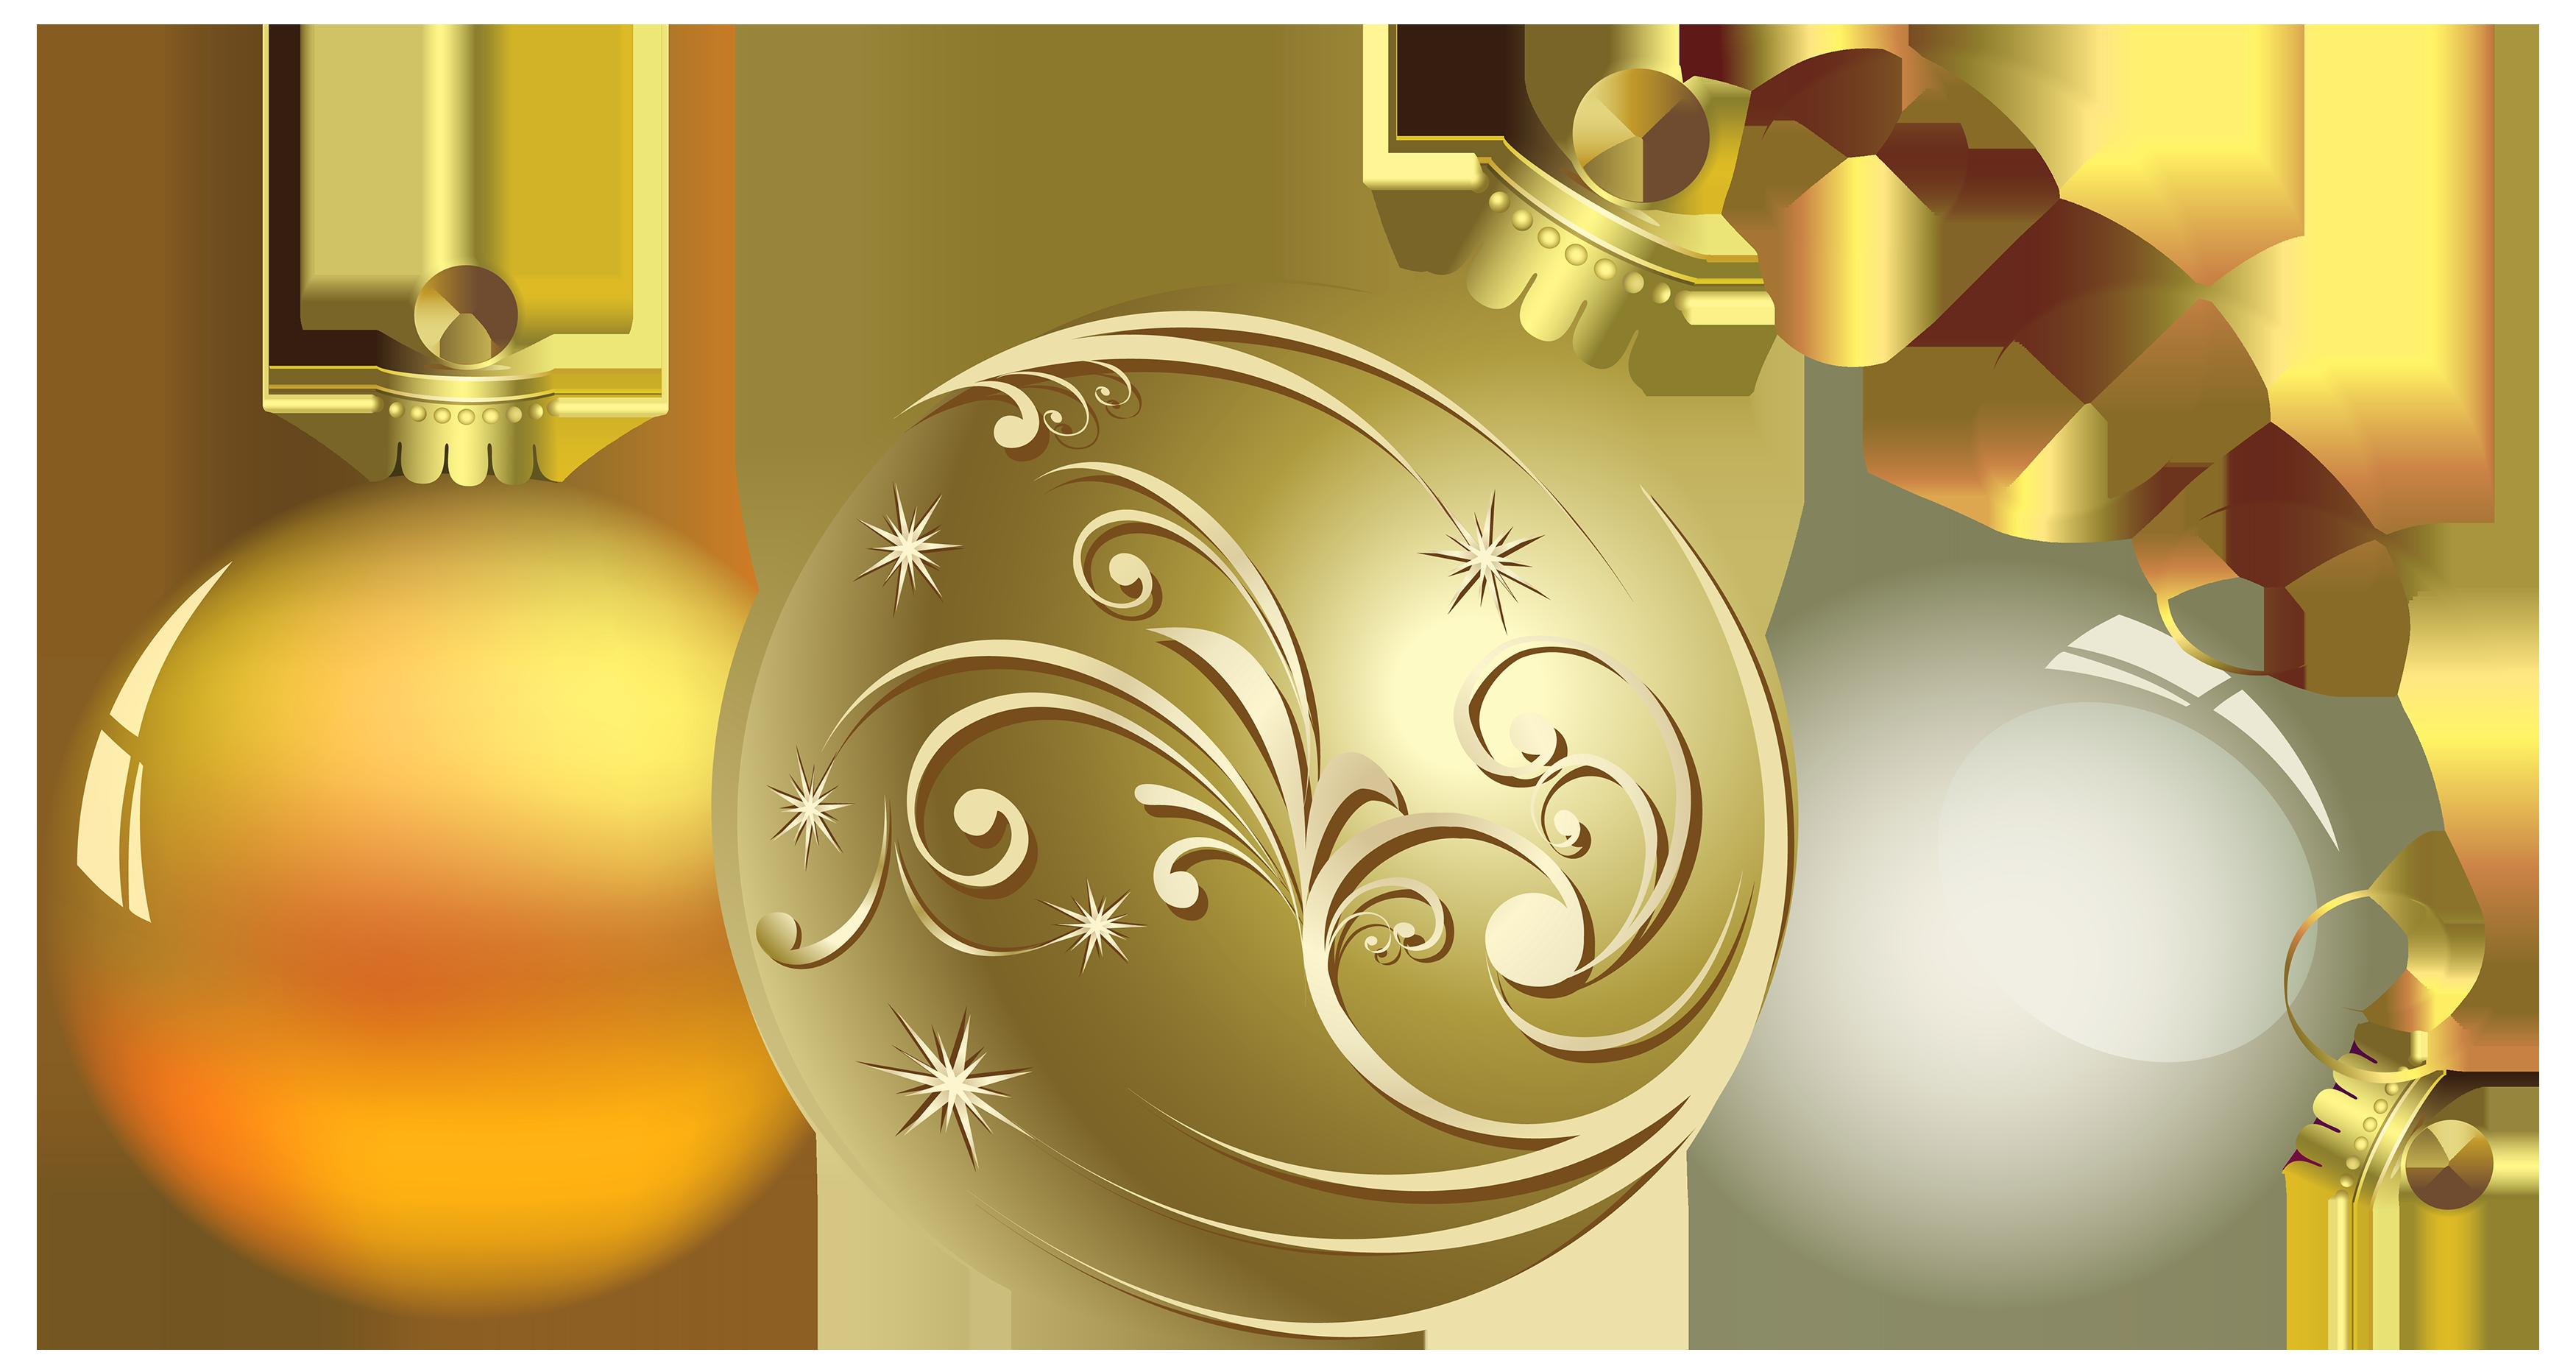 Christmas transparent image pinterest. Holiday clipart embellishment